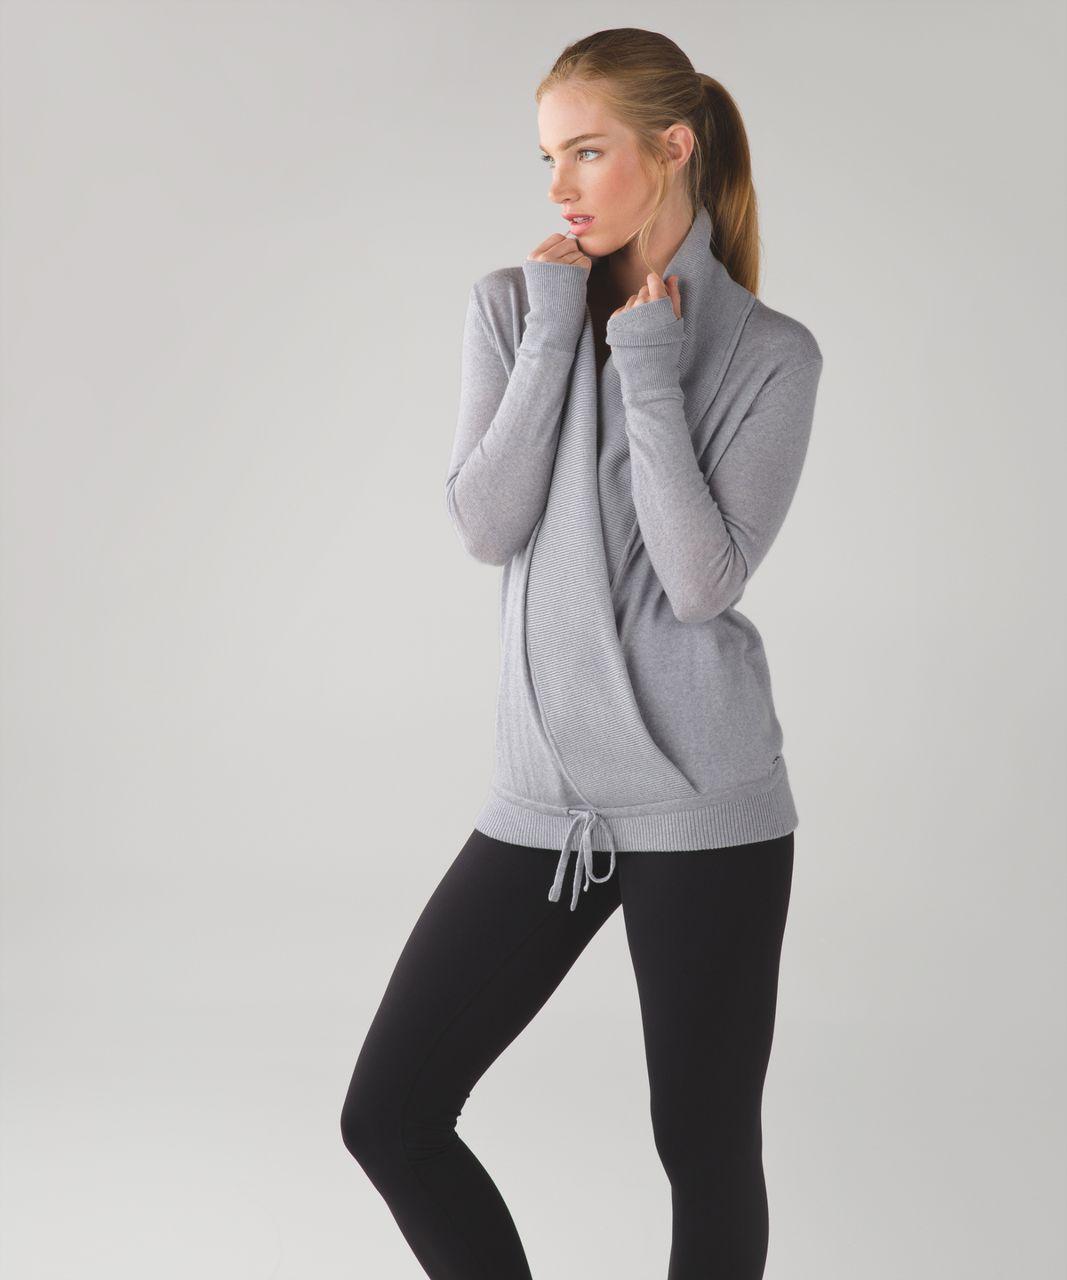 Lululemon Done Your Asana Pullover - Heathered Light Grey